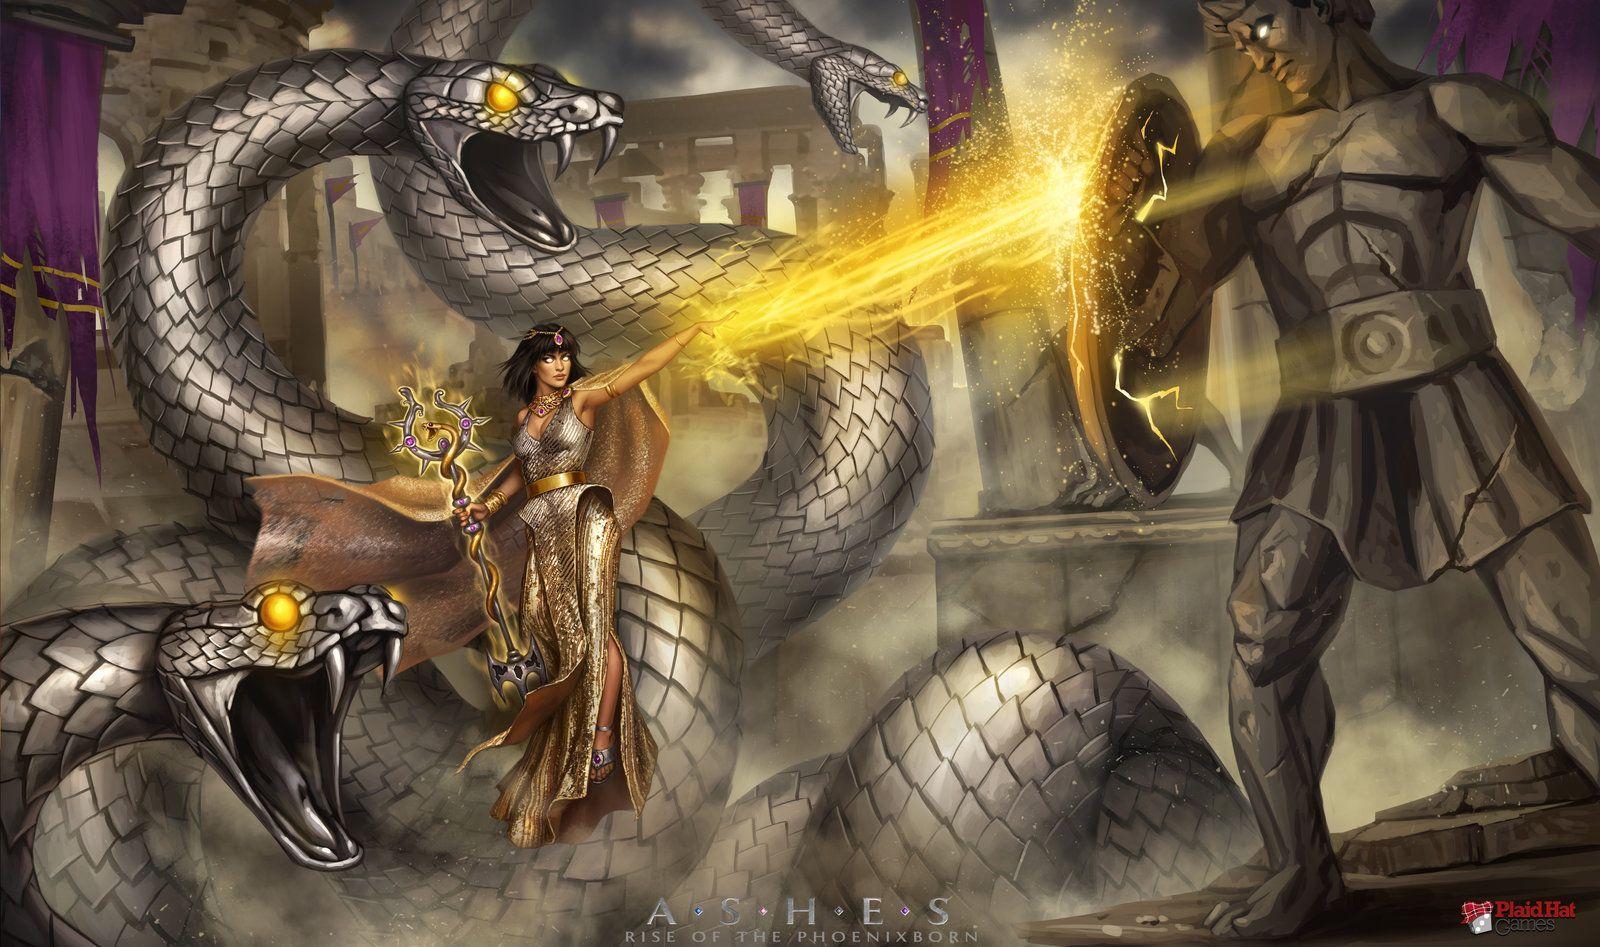 Ashes: Silverwood by fdasuarez on DeviantArt